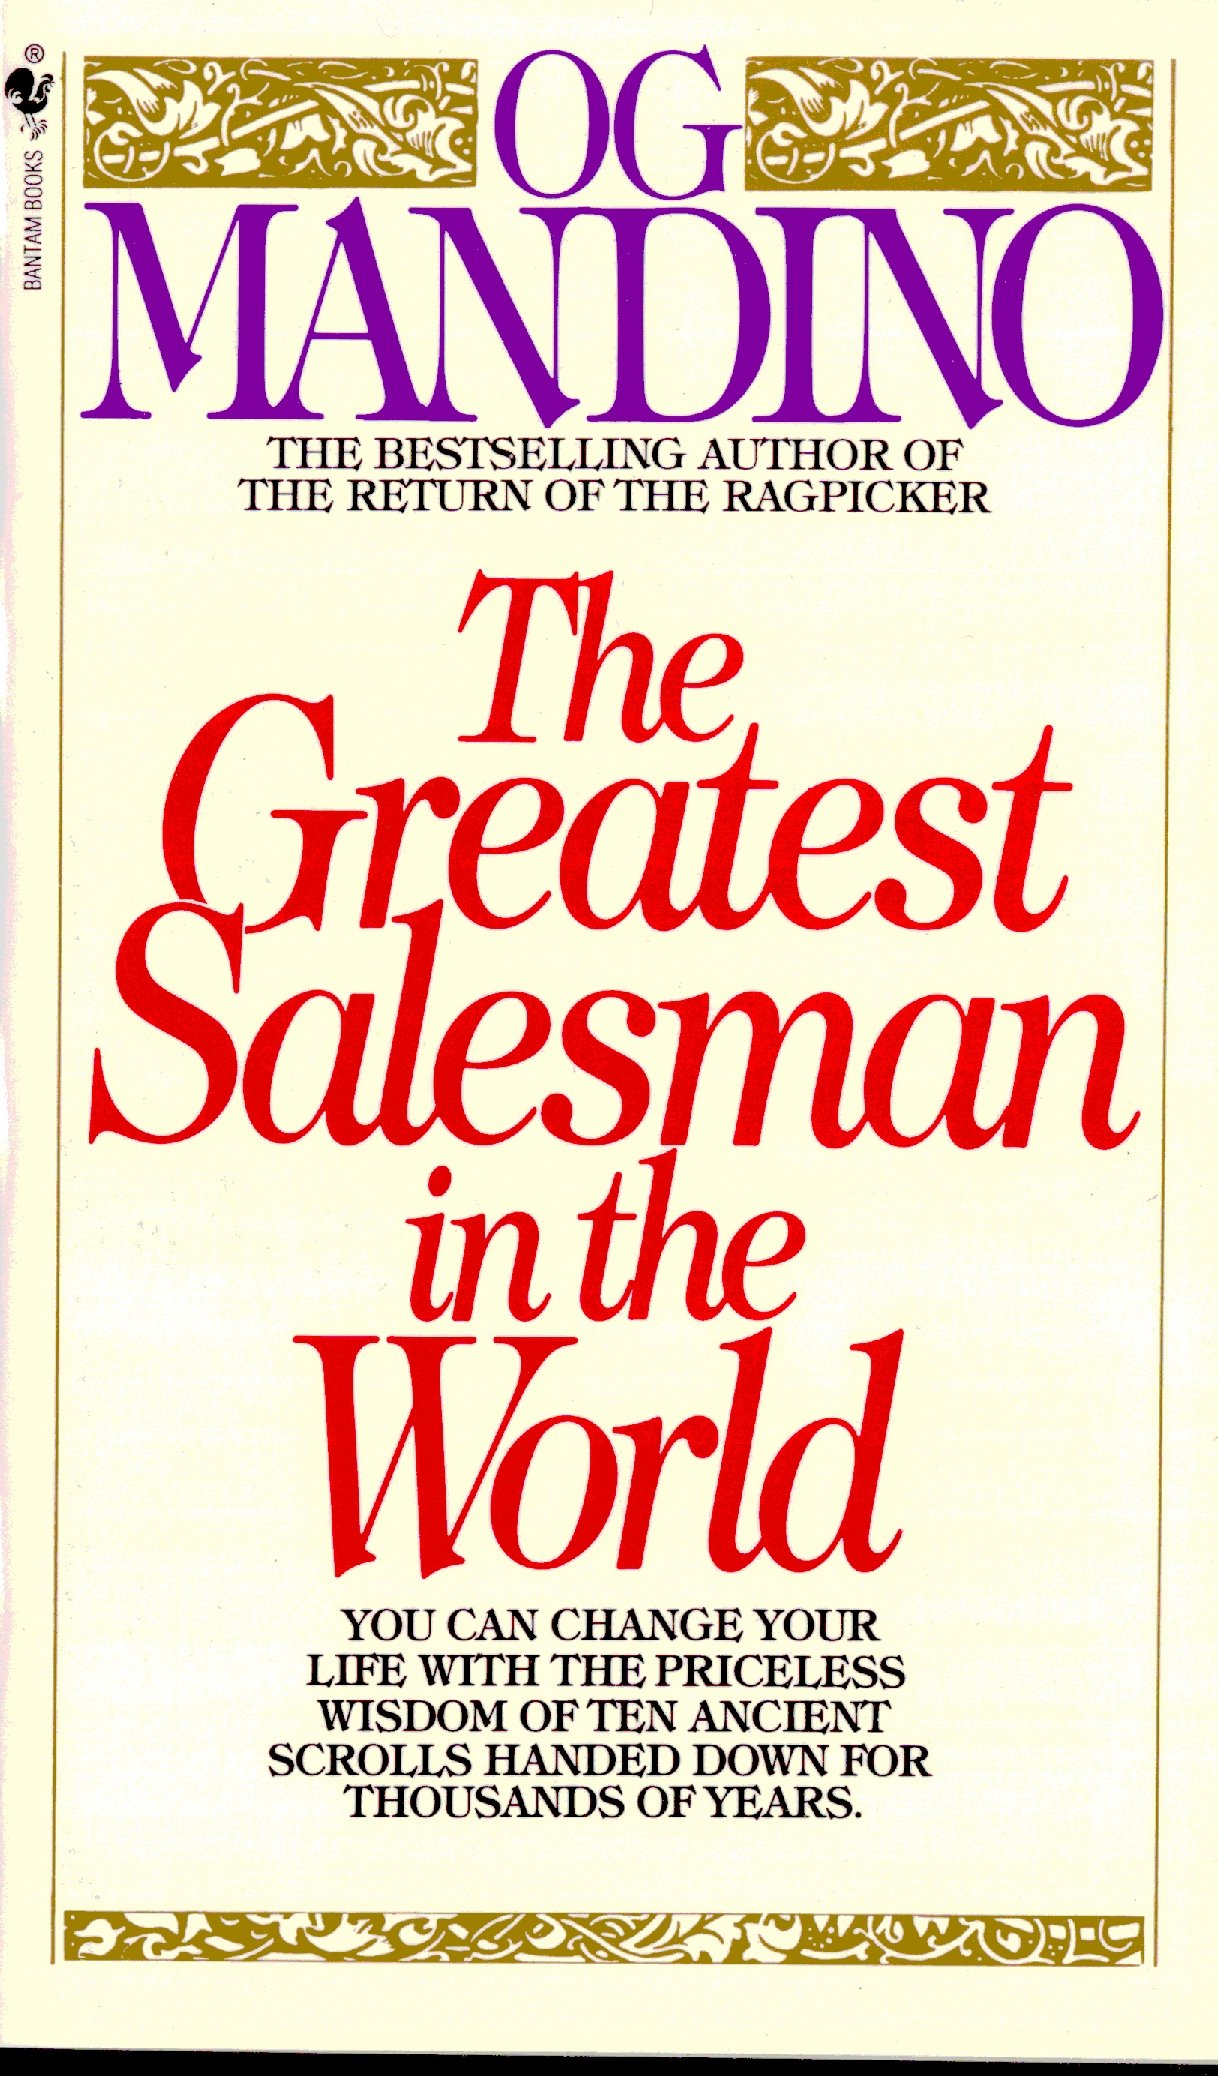 The Greatest Salesman in the World: Mandino, Og: 8601234583790: Amazon.com:  Books